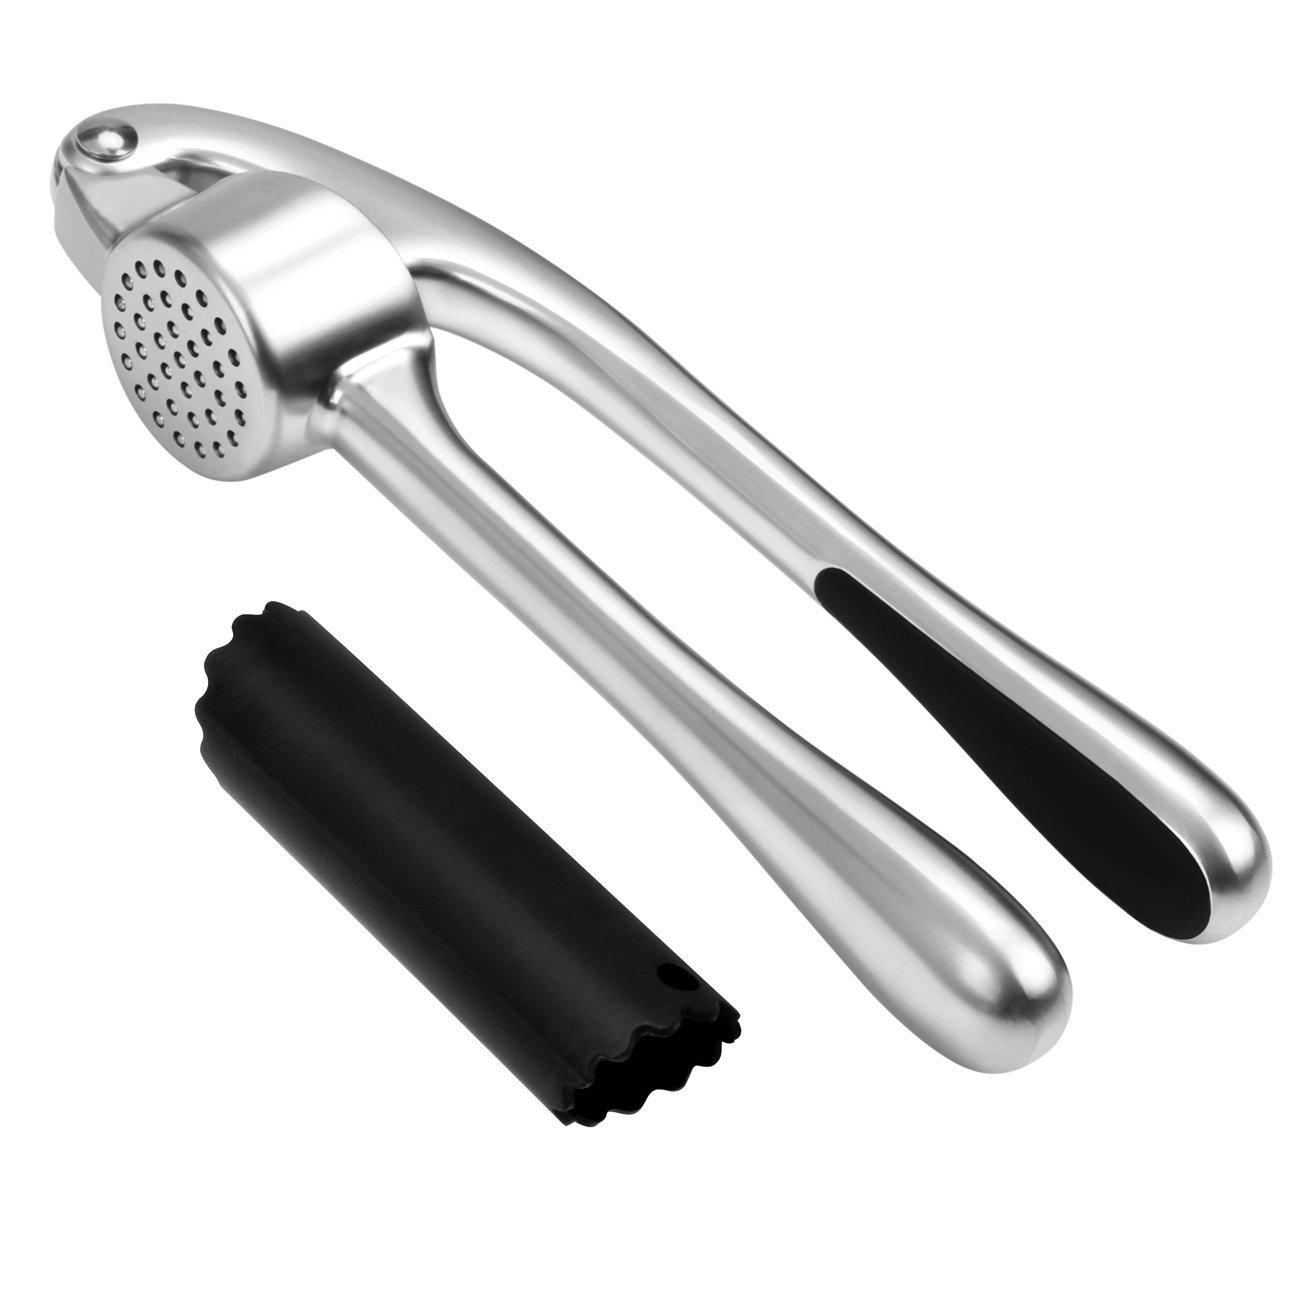 Garlic Press,Heavy Duty Garlic Press Peeler Set with Silicone Tube Roller @$6.99 AC+FS With Amazon Prime